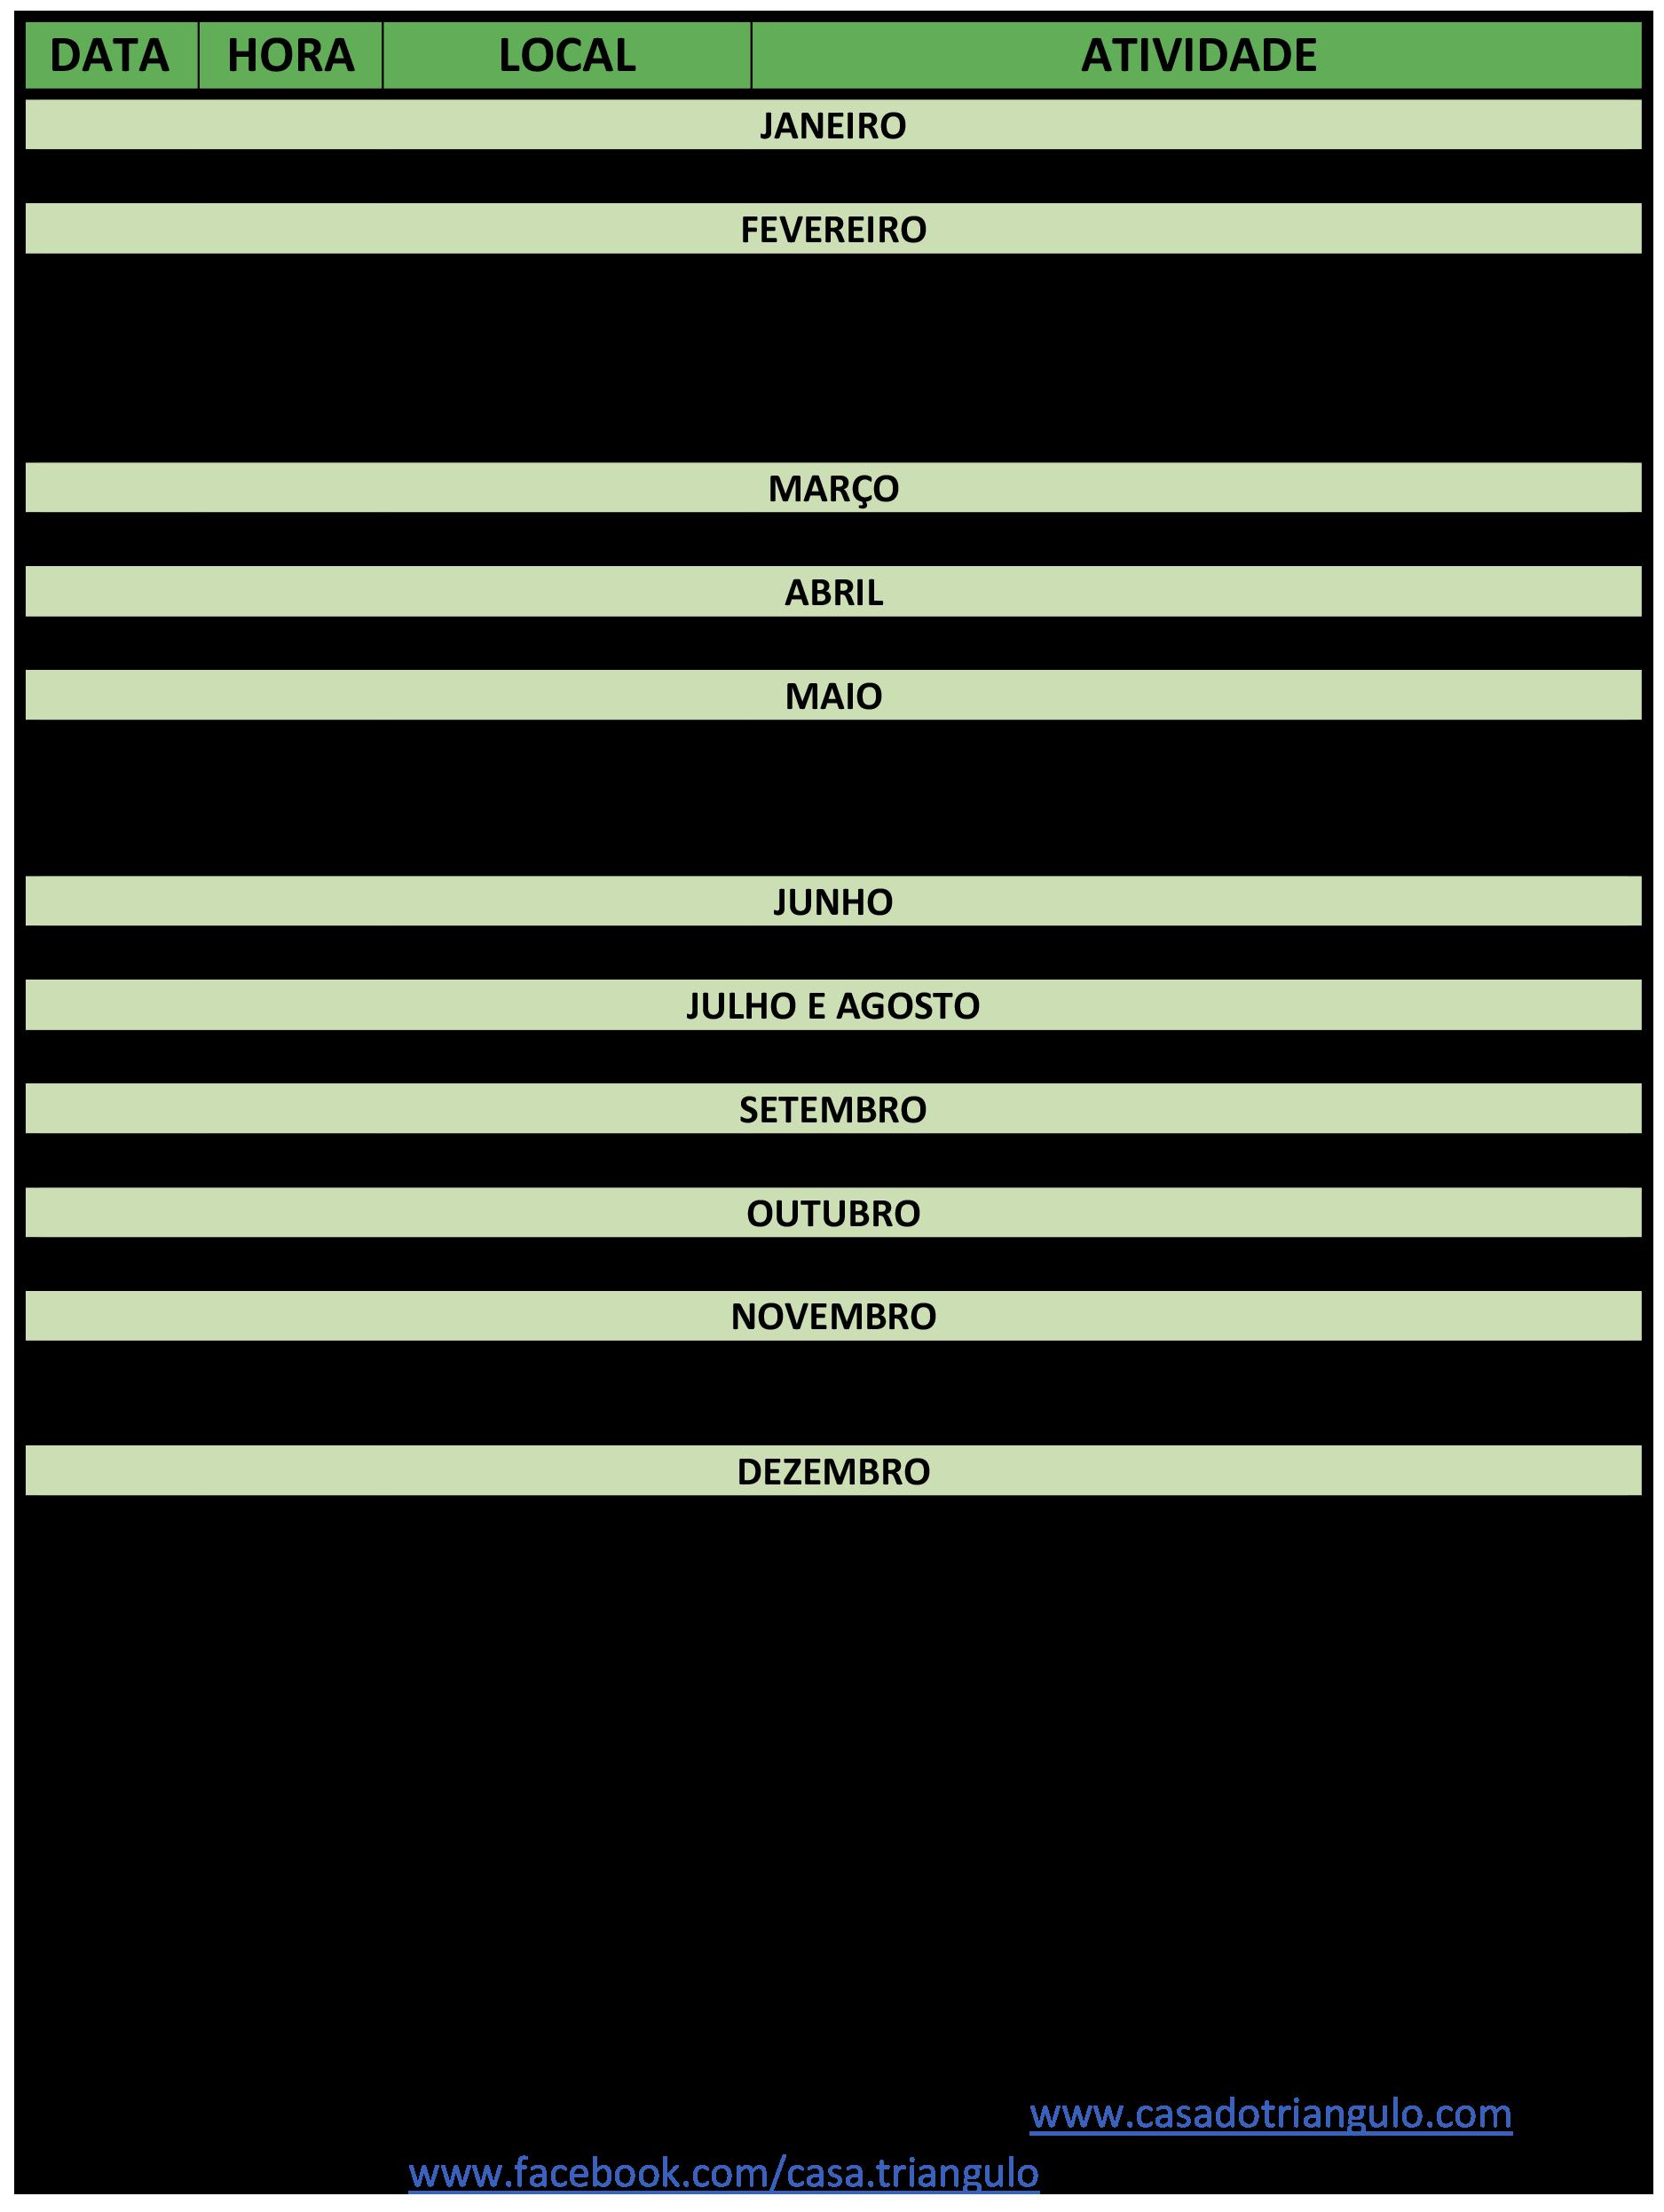 Cronograma - Plano de Atividades 2017 CT (versao3)